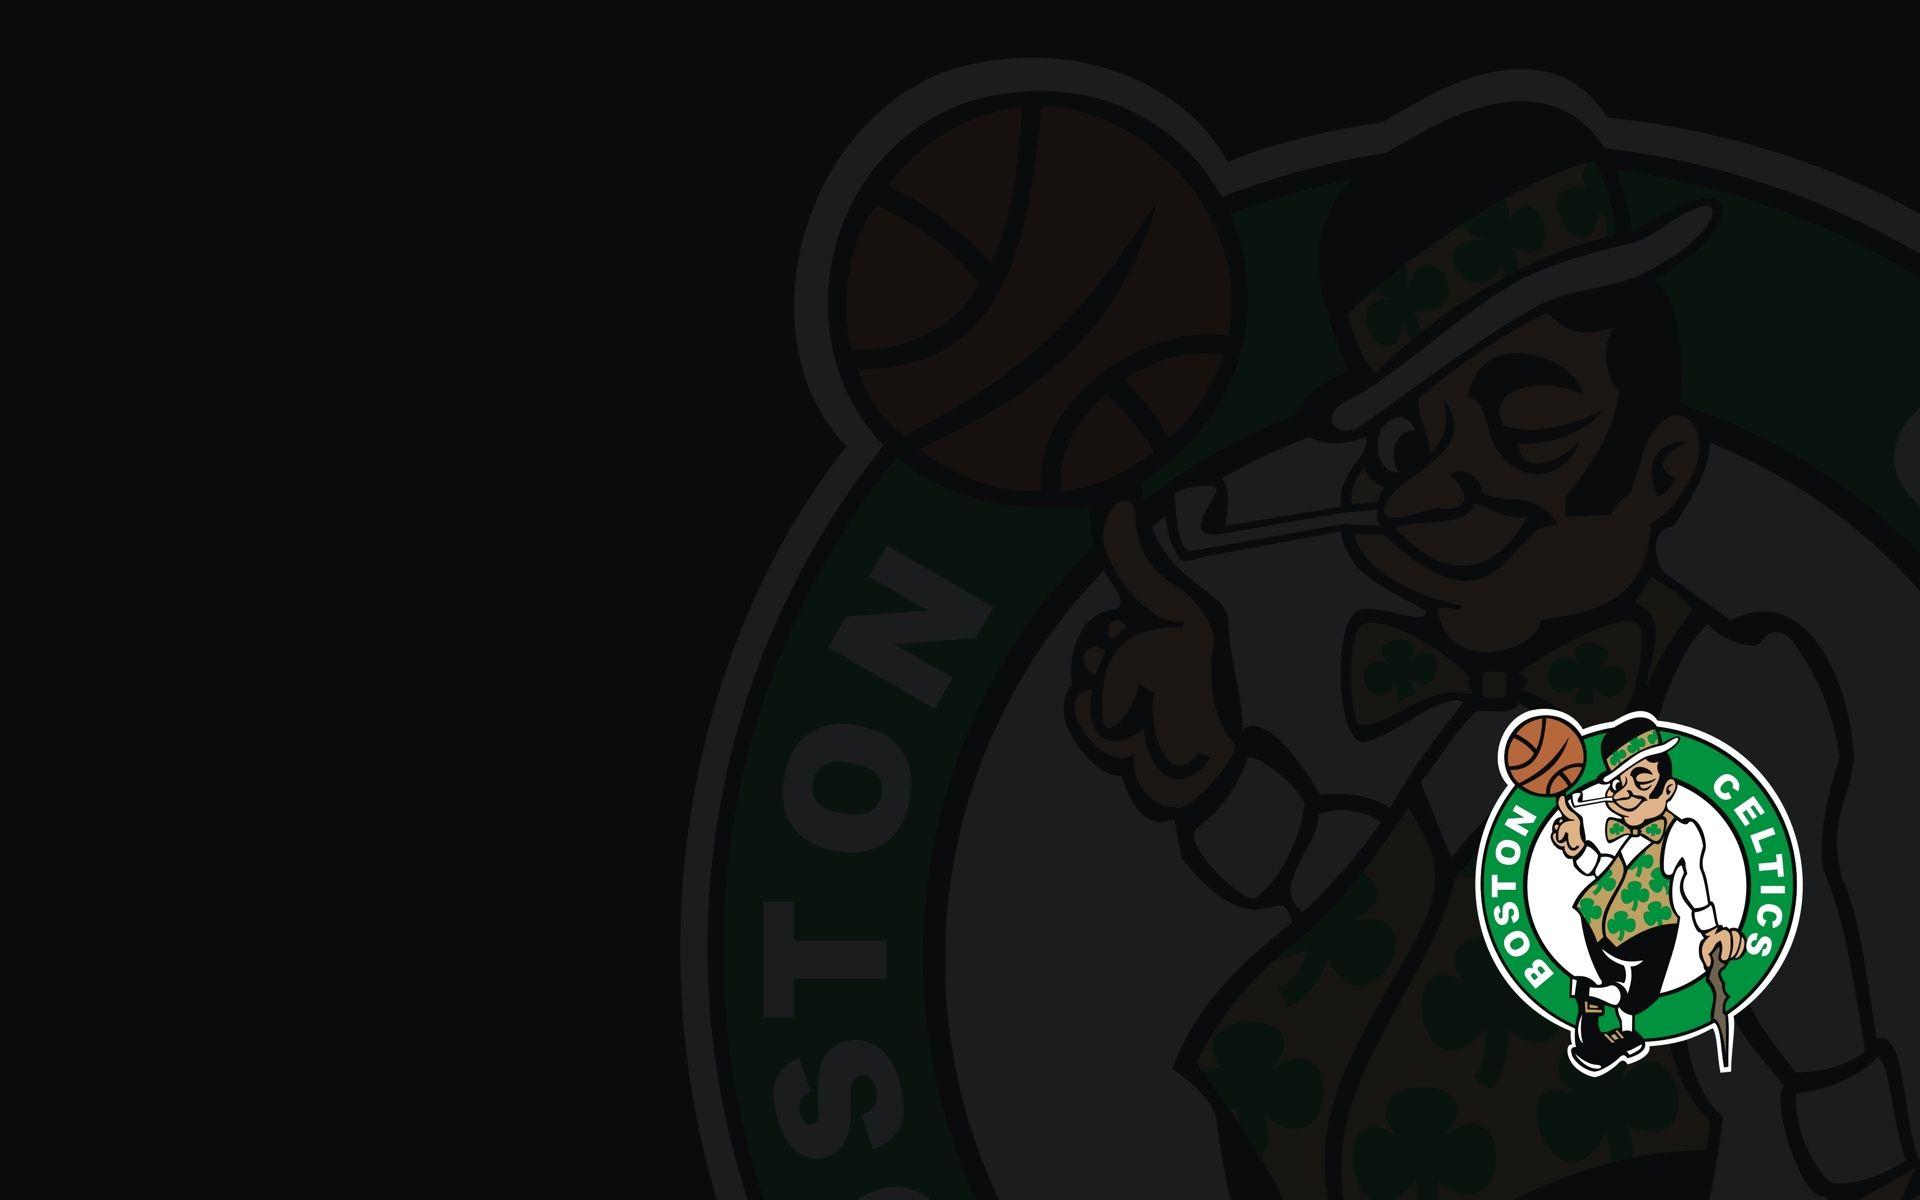 Boston Celtics Wallpaper Hd , HD Wallpaper & Backgrounds